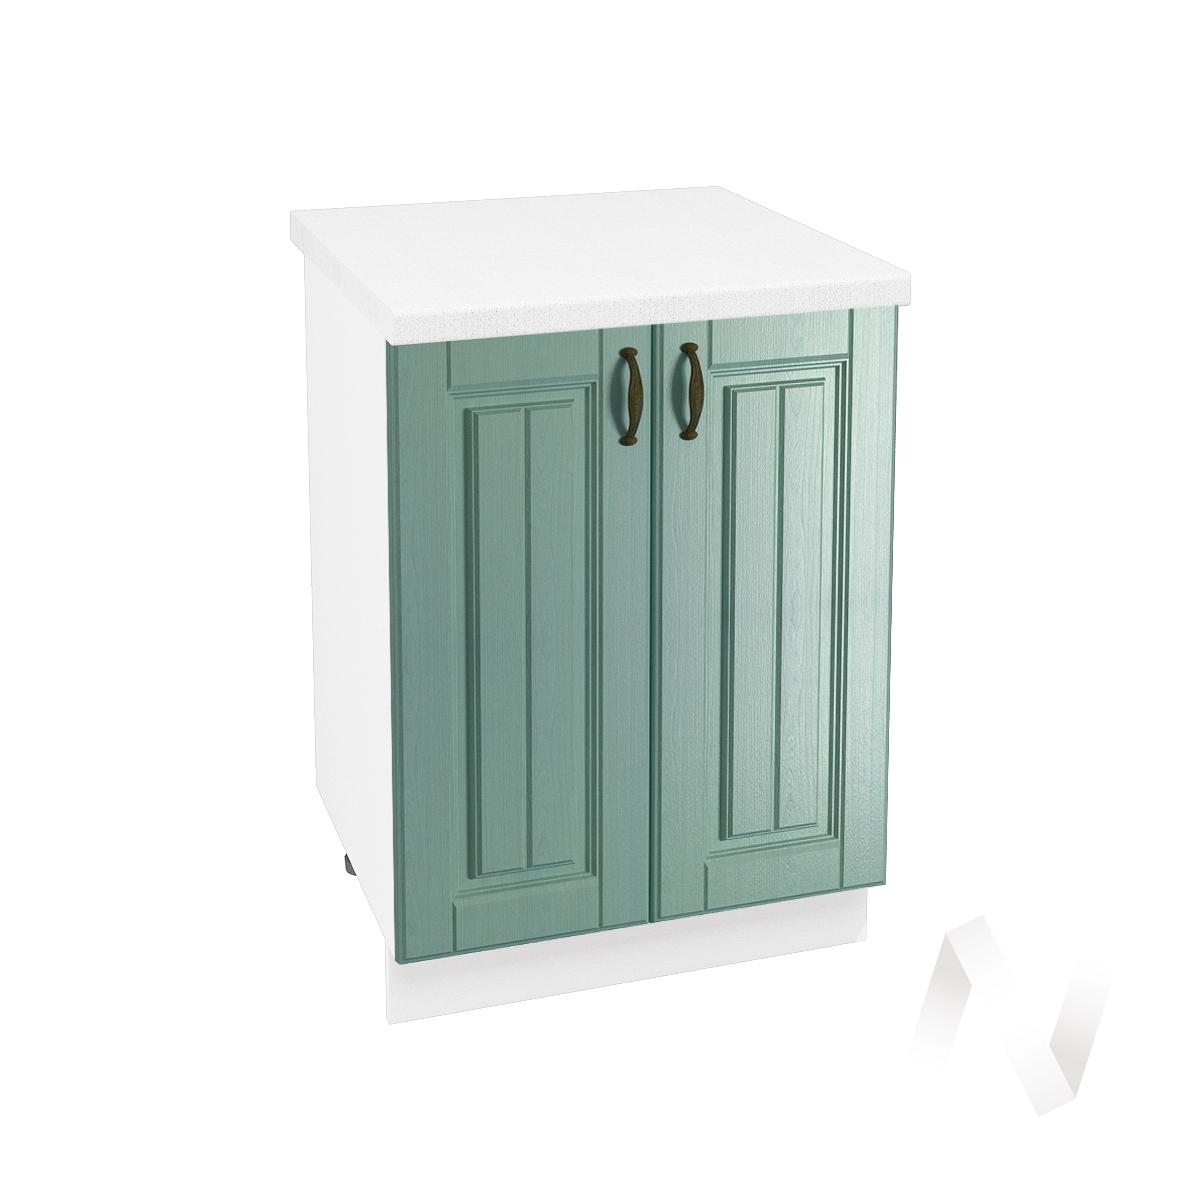 "Кухня ""Прованс"": Шкаф нижний 600, ШН 600 новый (корпус белый)"